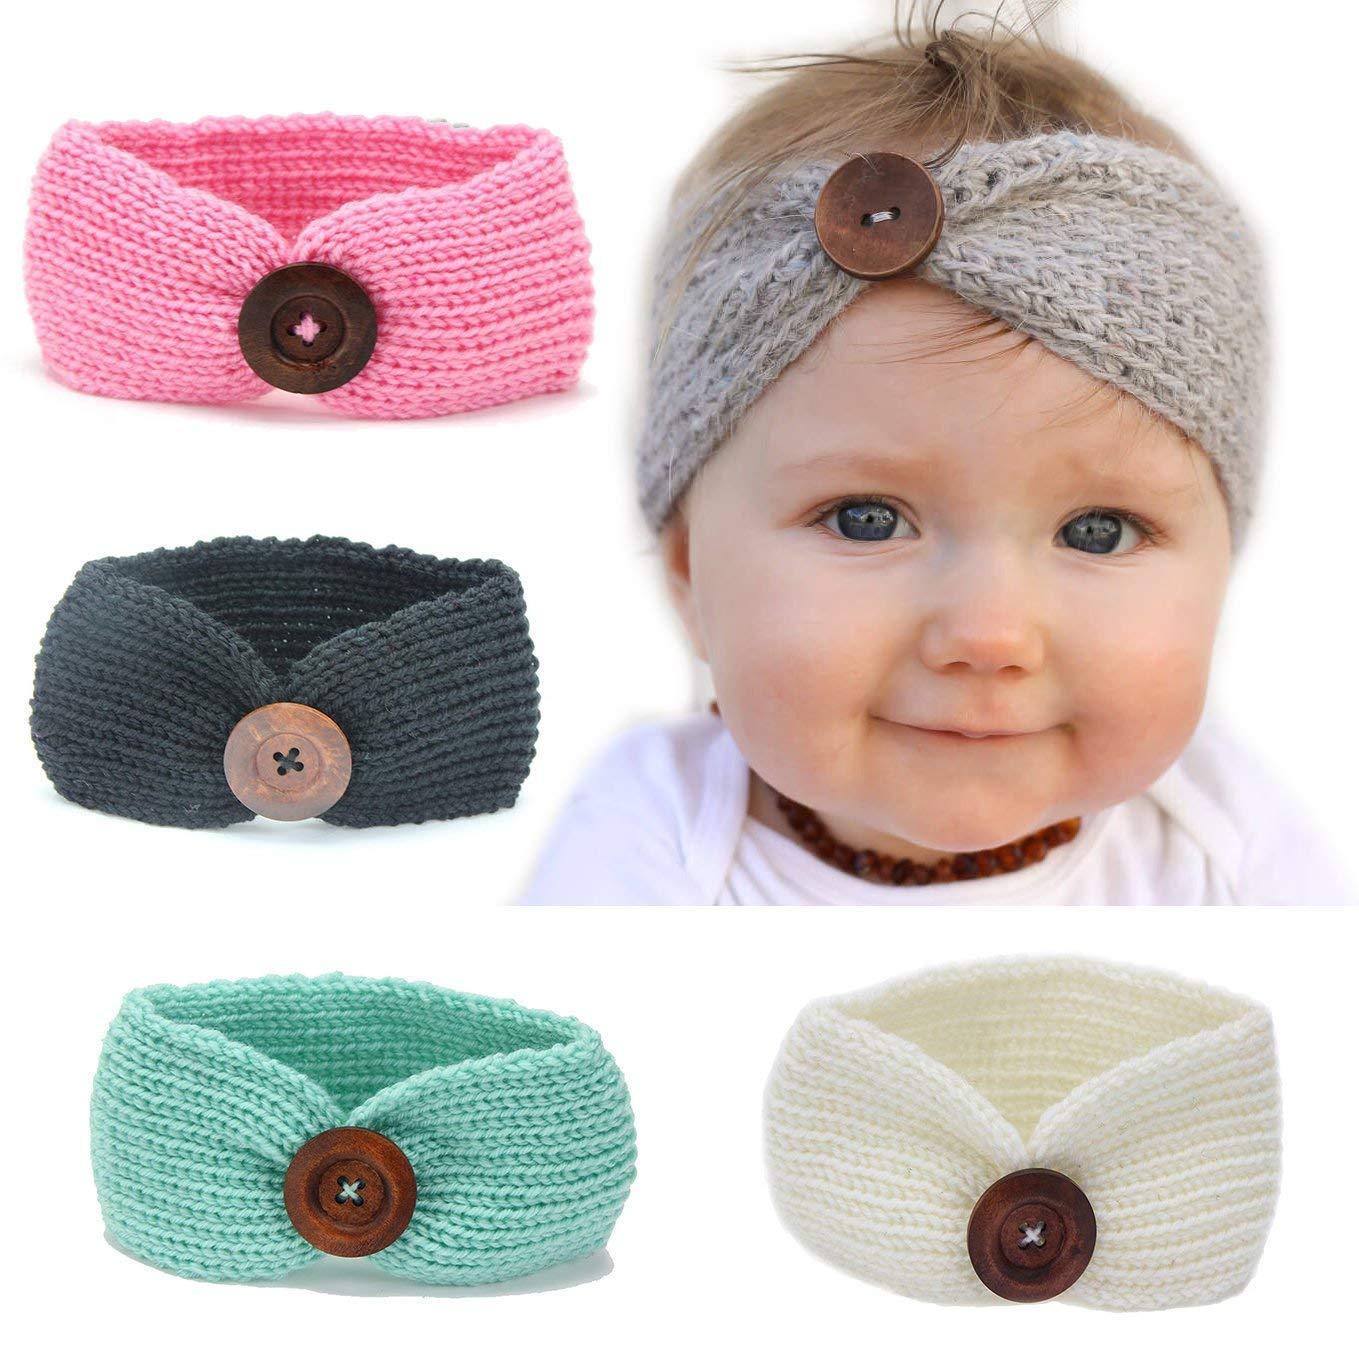 Newborn Baby Girls Toddler Crochet Knit Turban Headband Hair Band Accessories